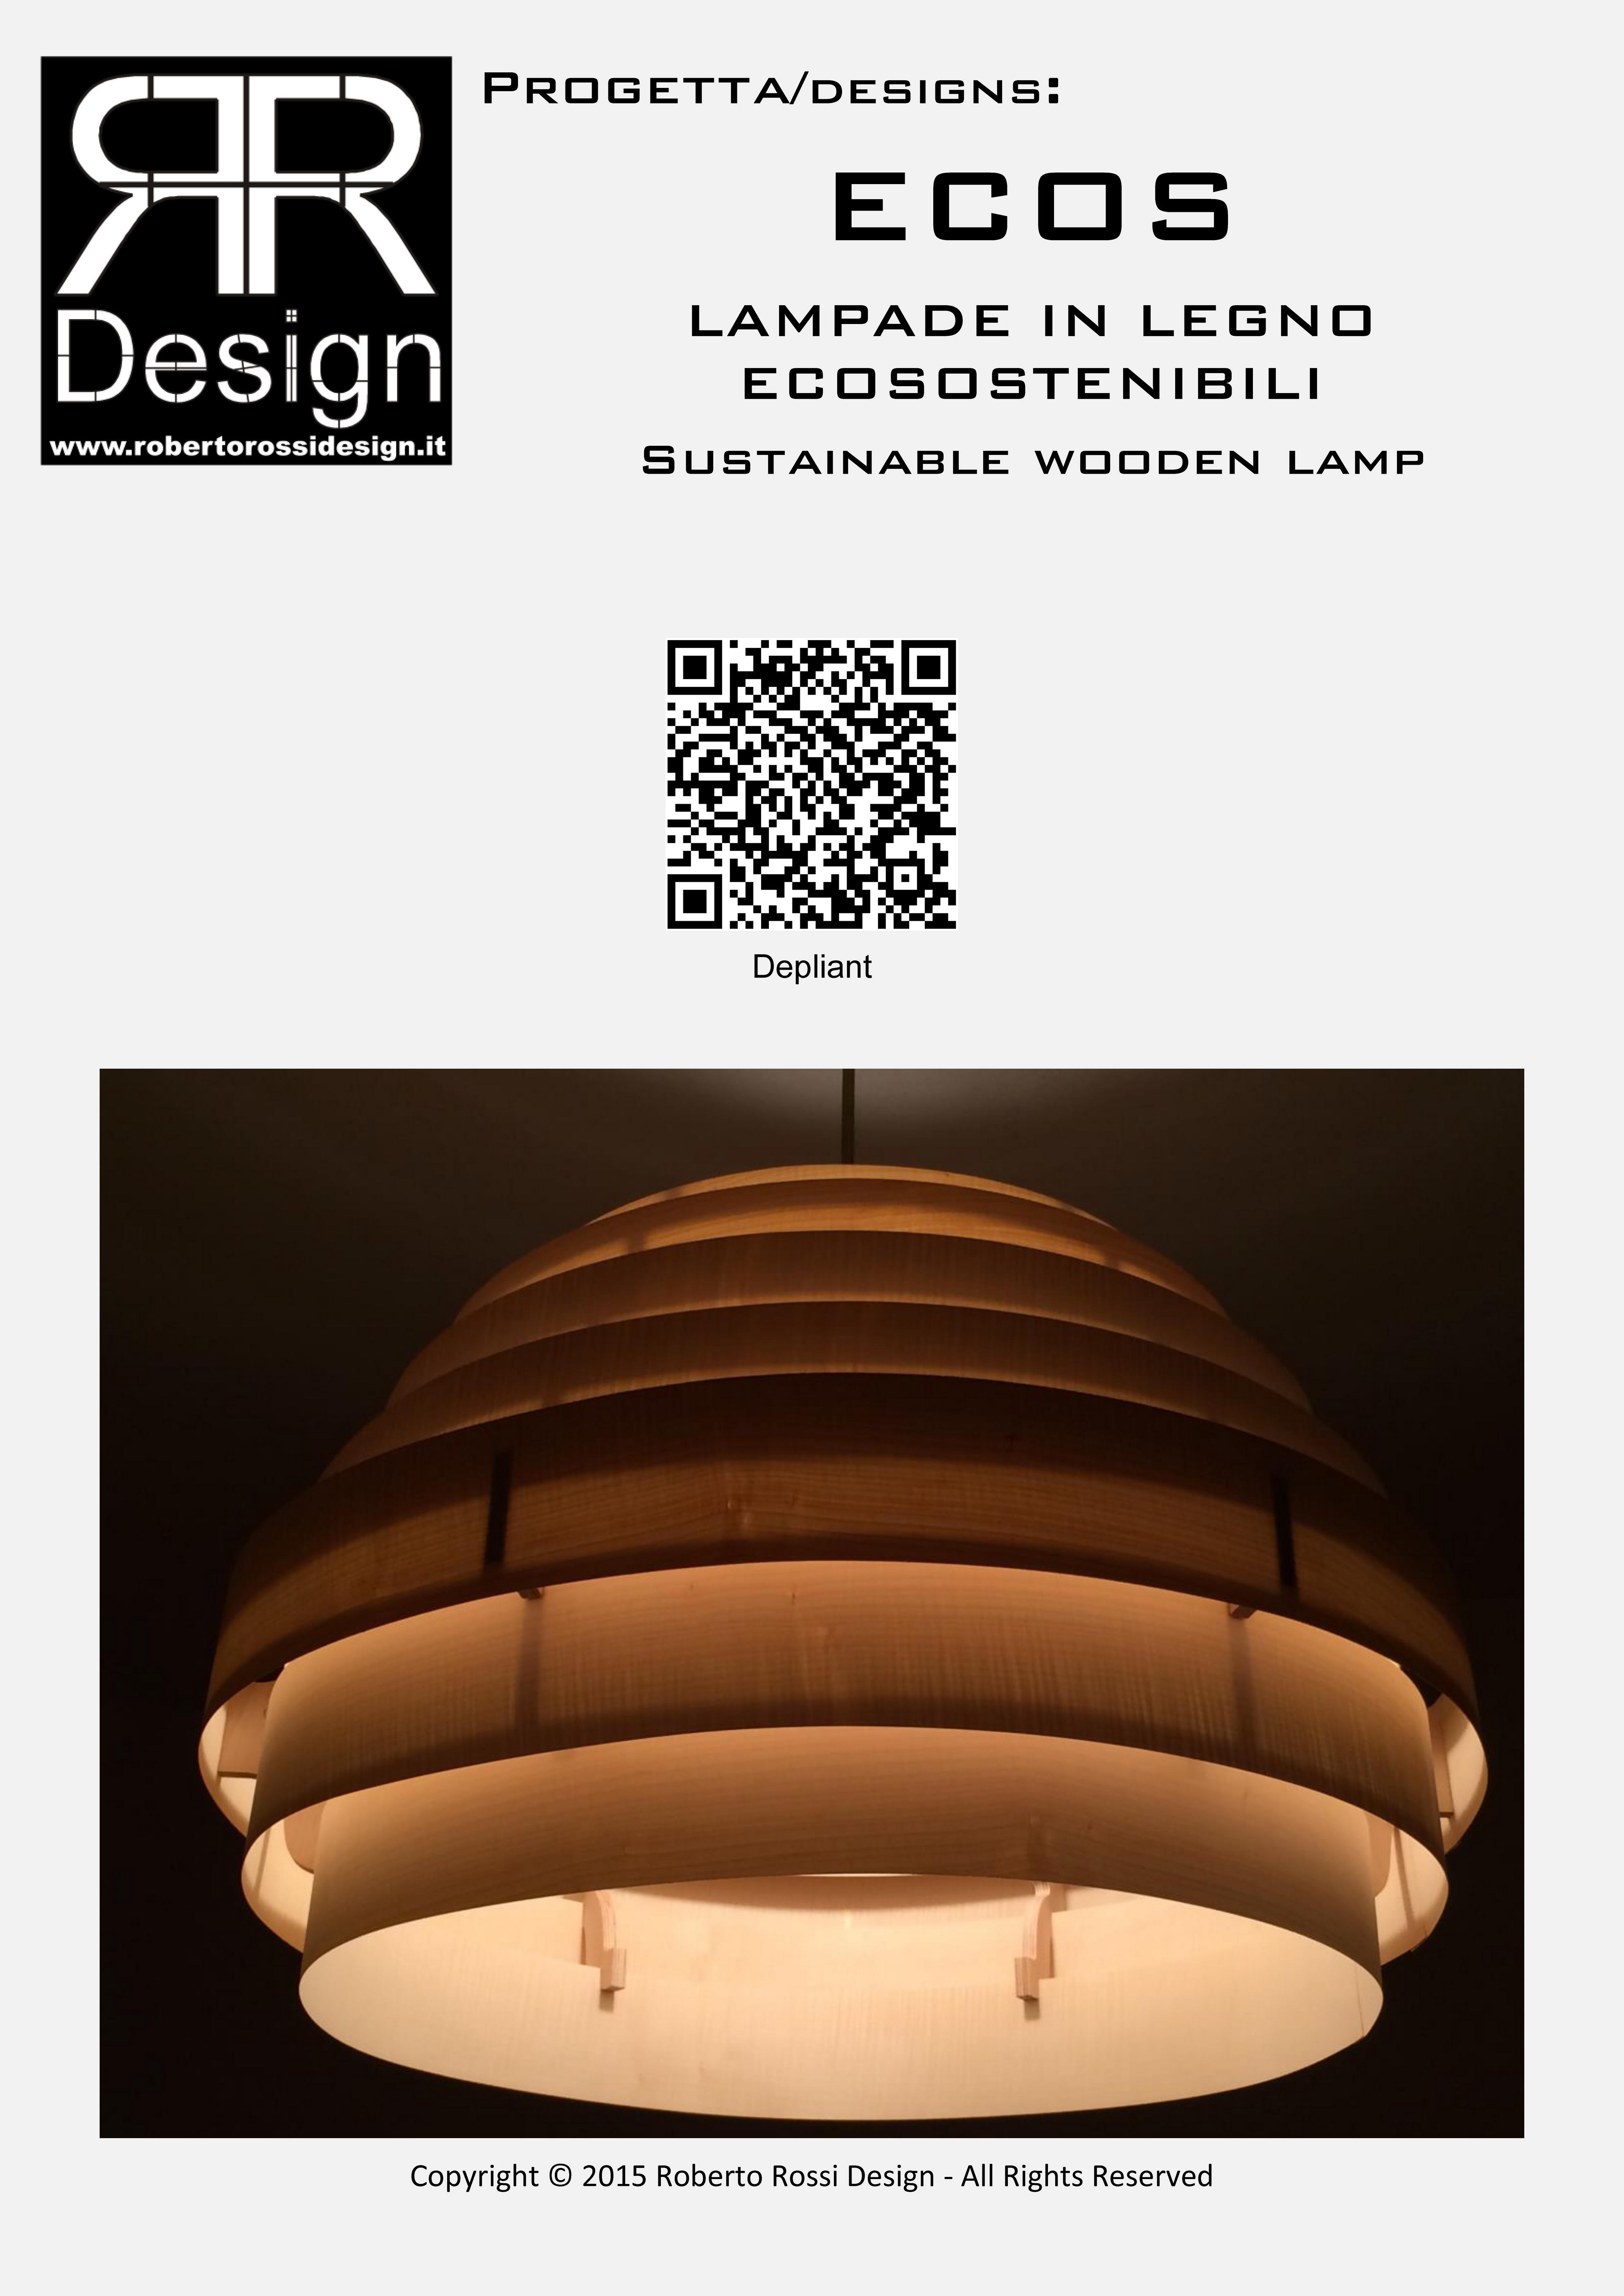 Depliant - LAMPADE IN LEGNO SERIE 'ECOS' (web)_rev3_Pagina_01_resize.jpg